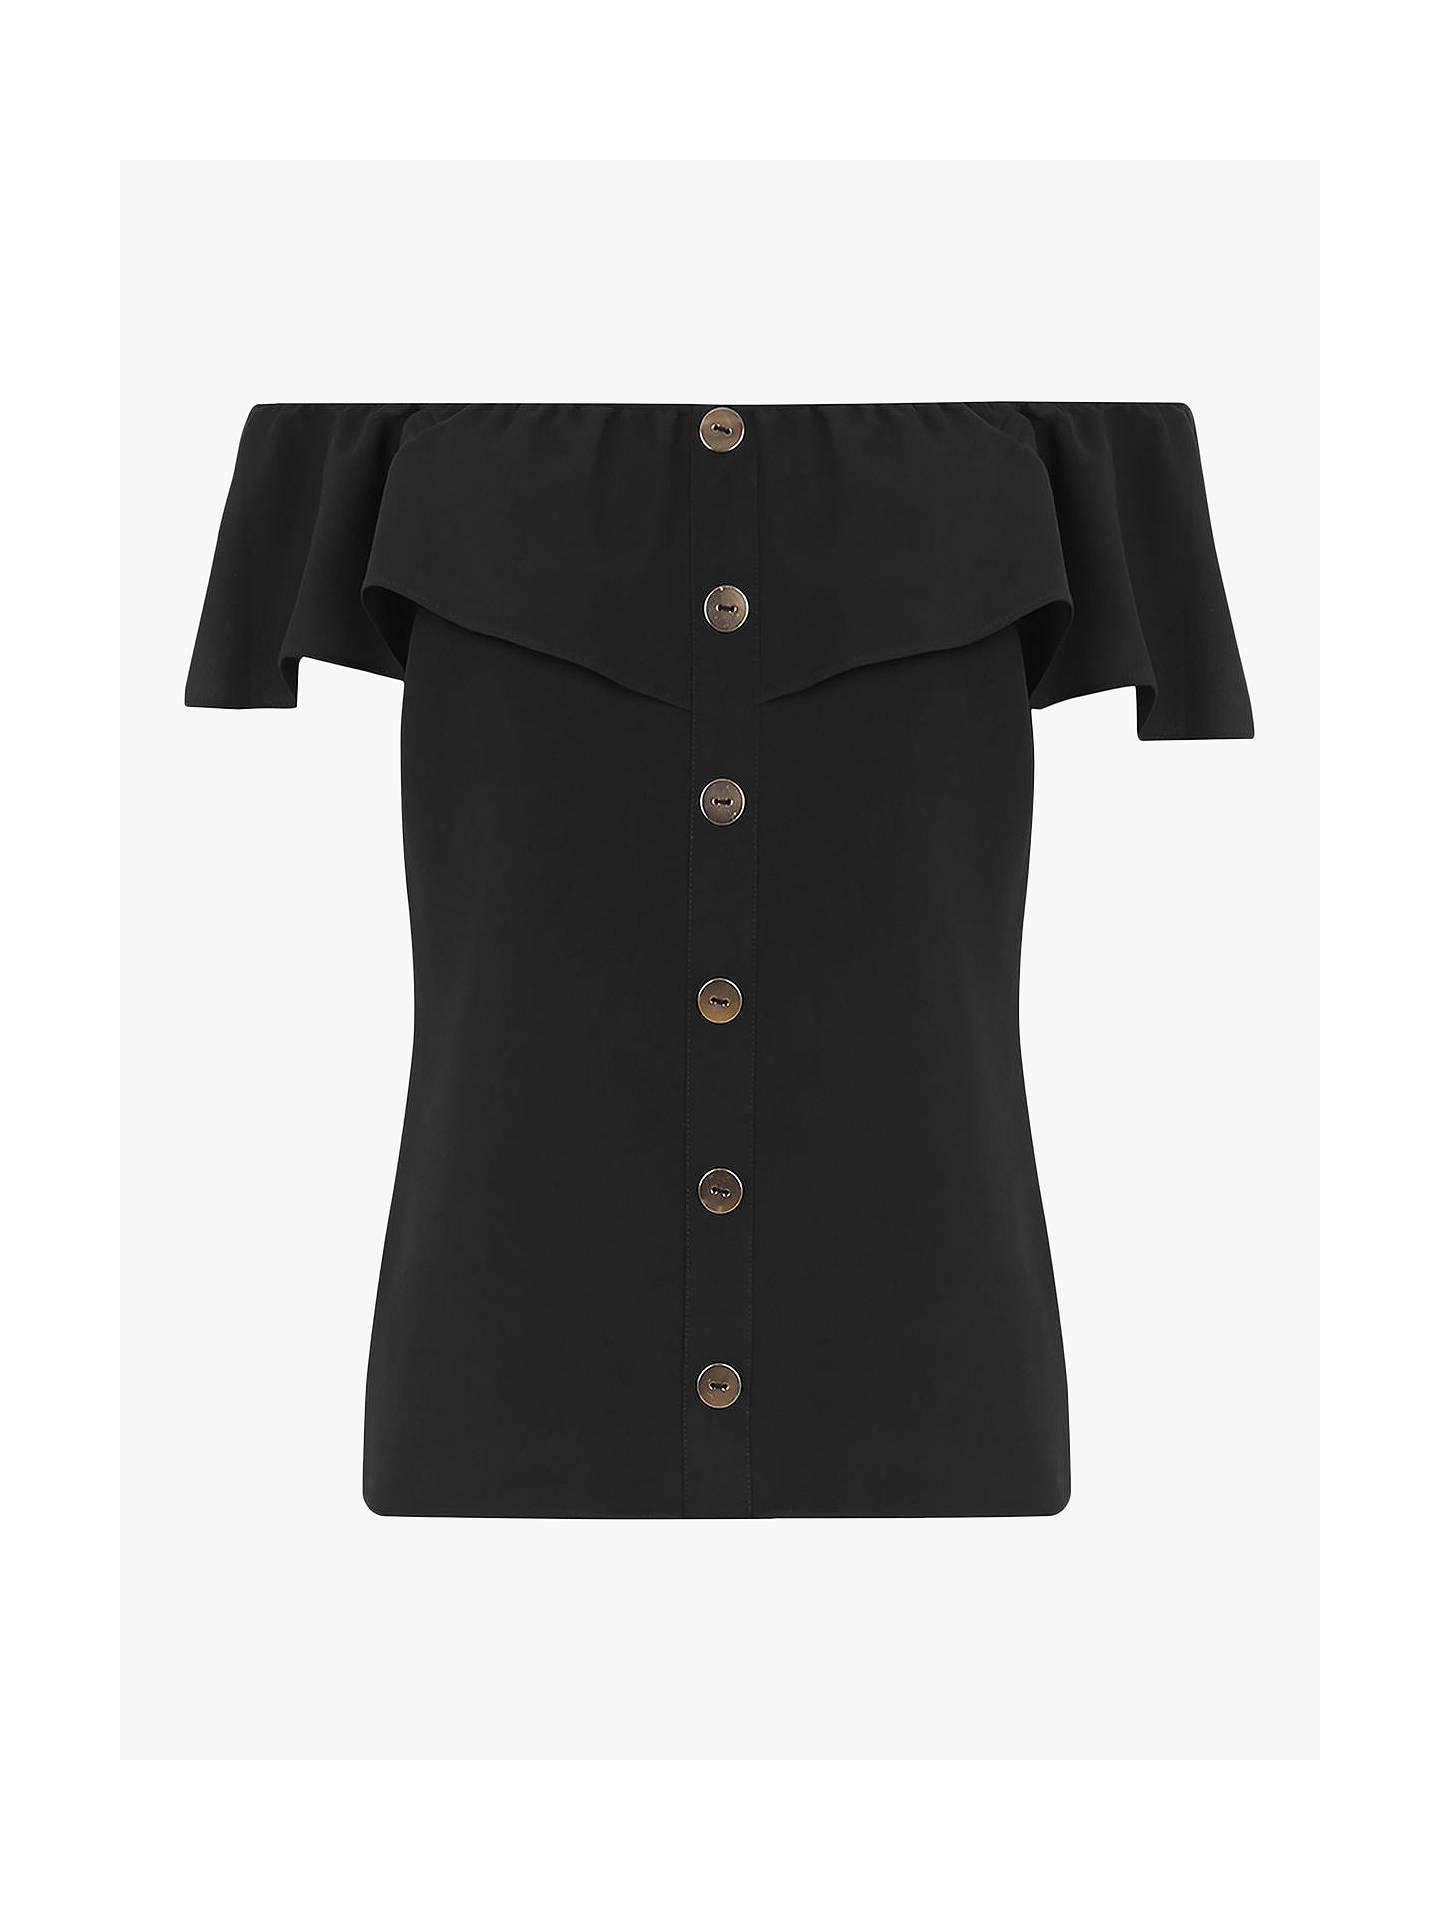 1195d1faff7 ... Buy Oasis Button Through Bardot Top, Black, 6 Online at johnlewis.com  ...